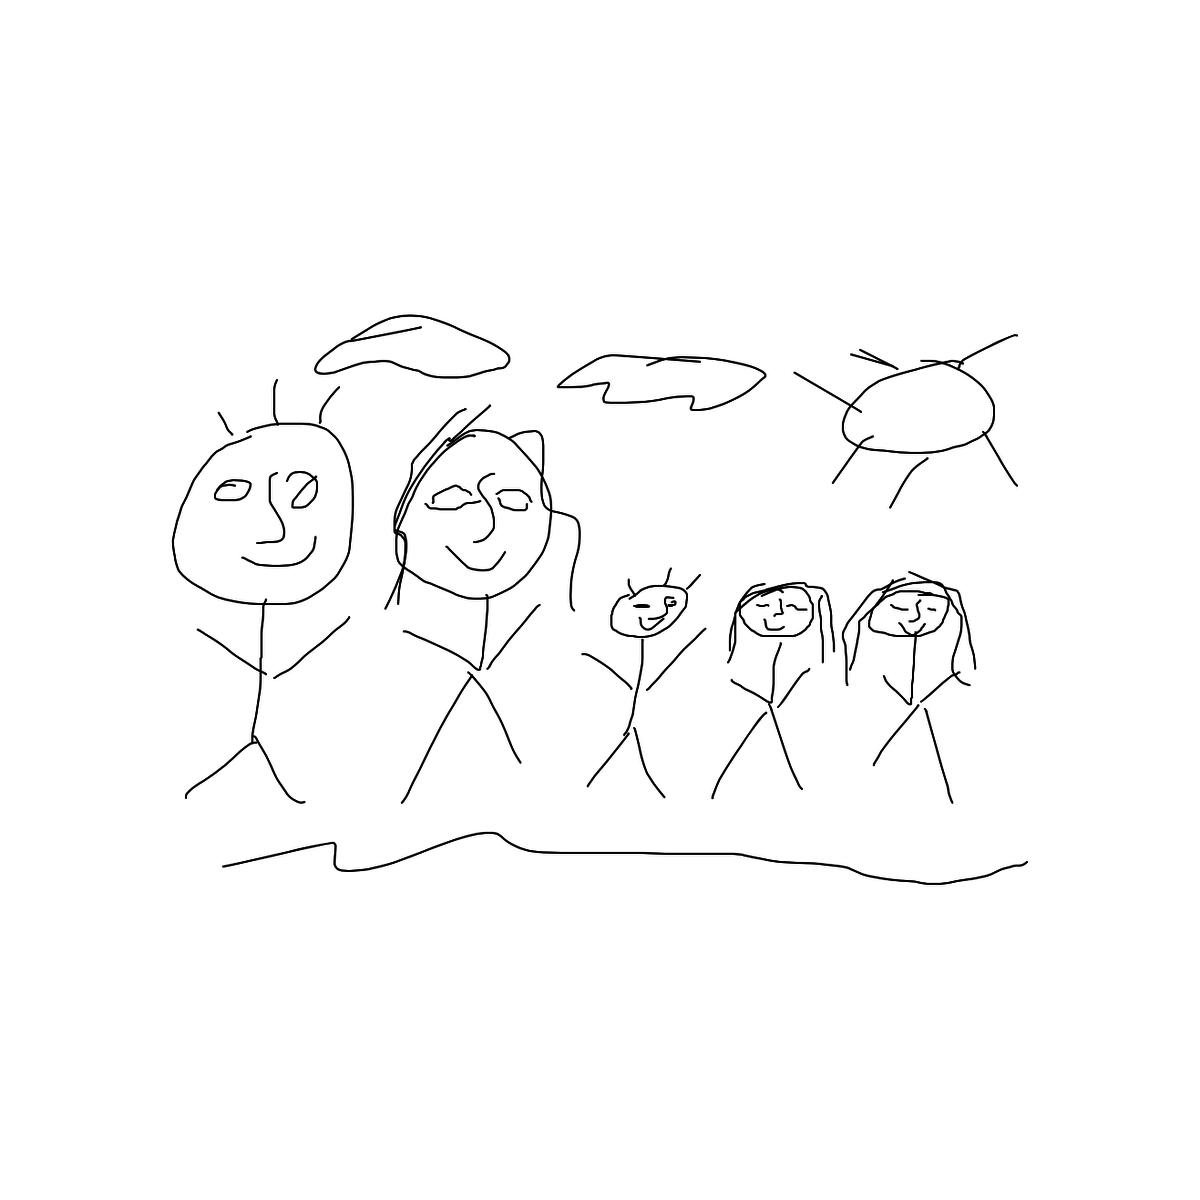 BAAAM drawing#5571 lat:38.2669448852539060lng: 21.7580432891845700